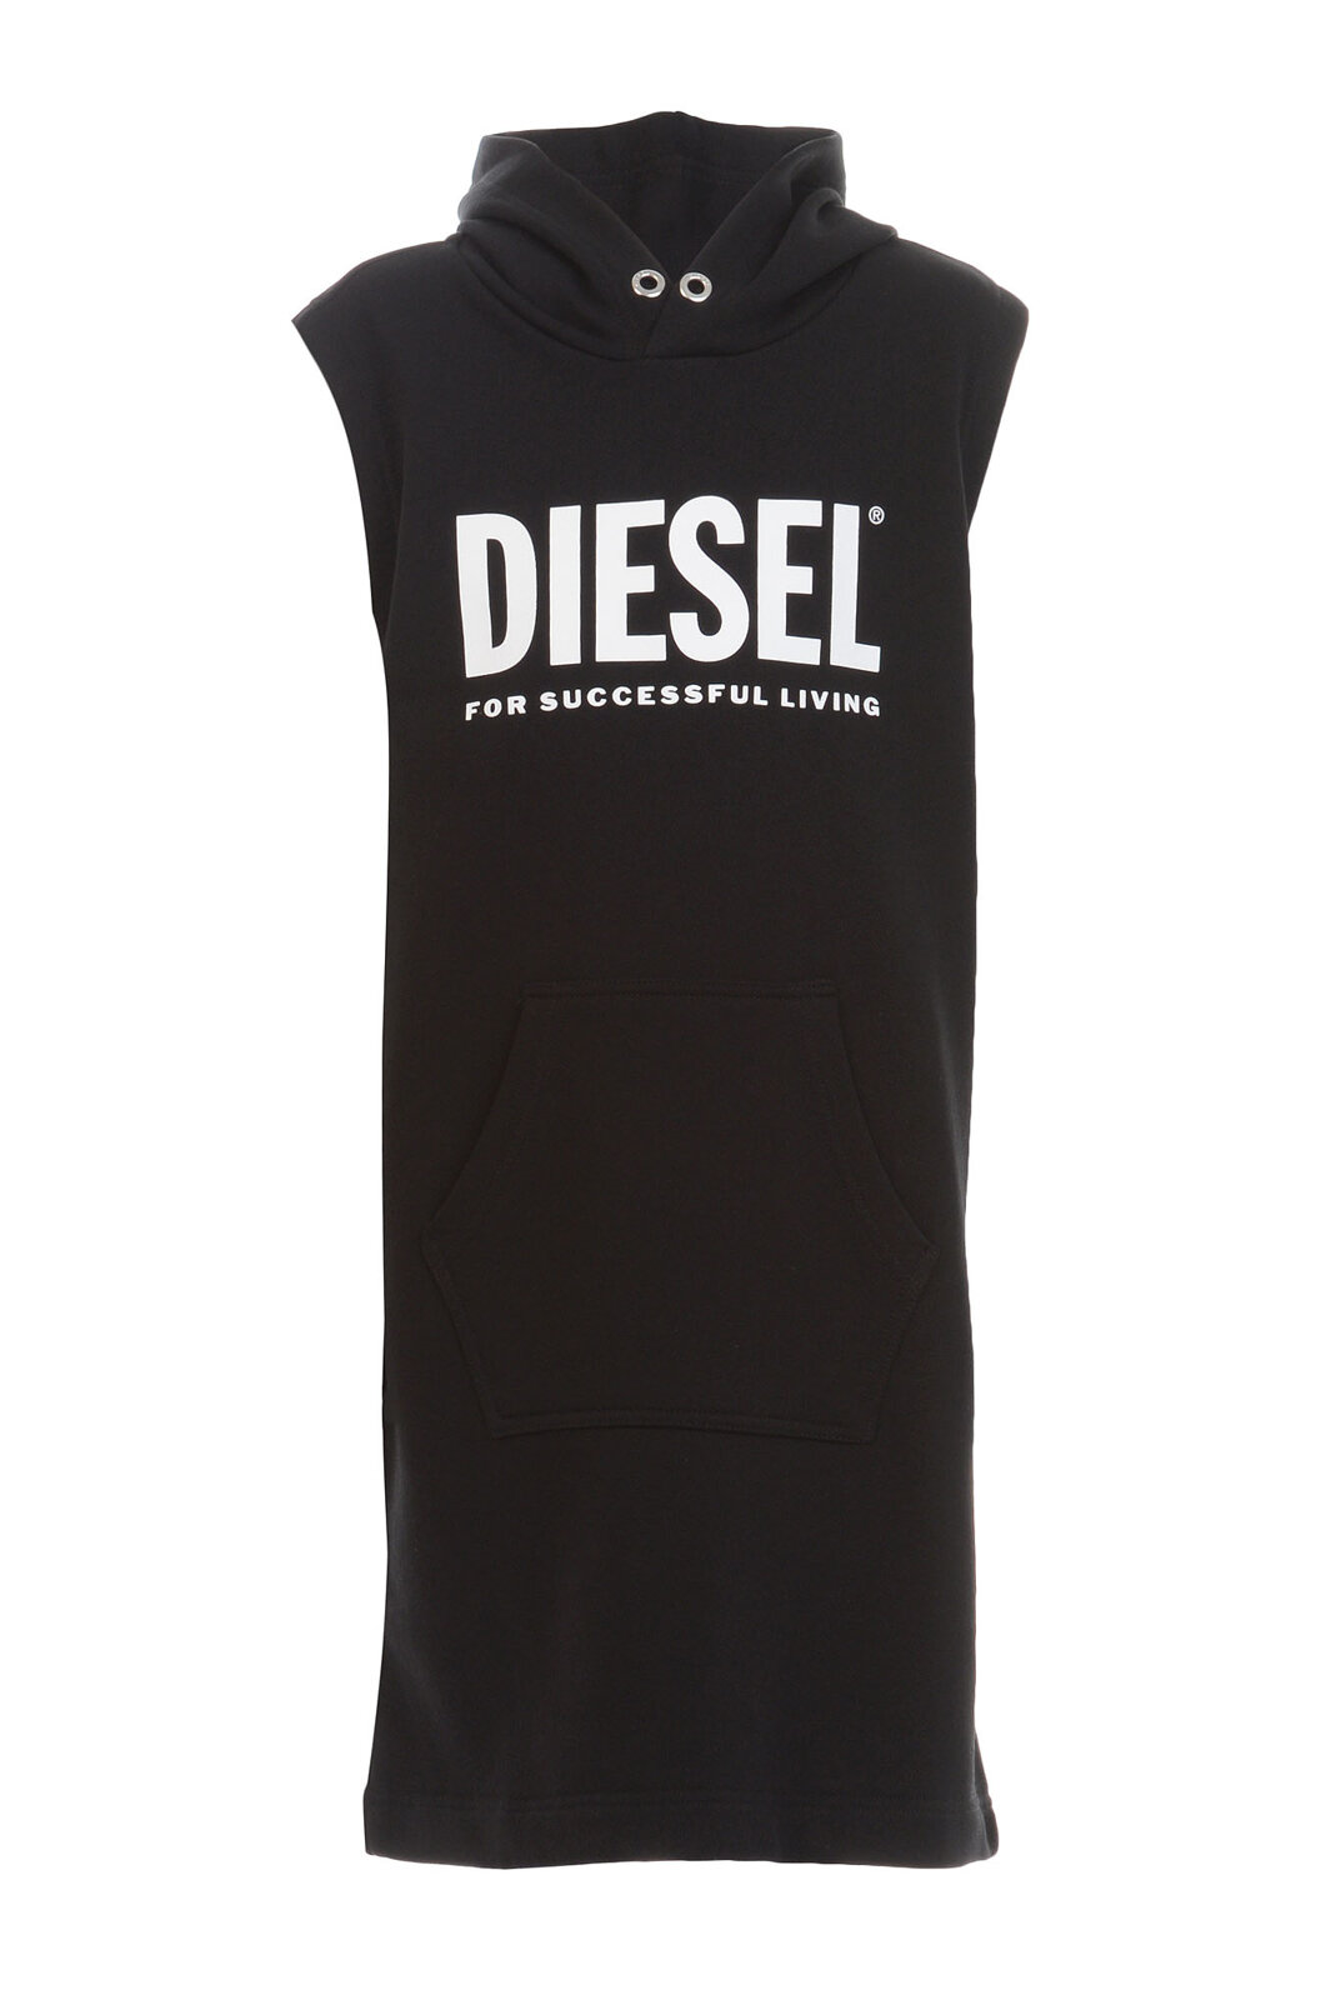 Dilset Sm Abito - Diesel Kid